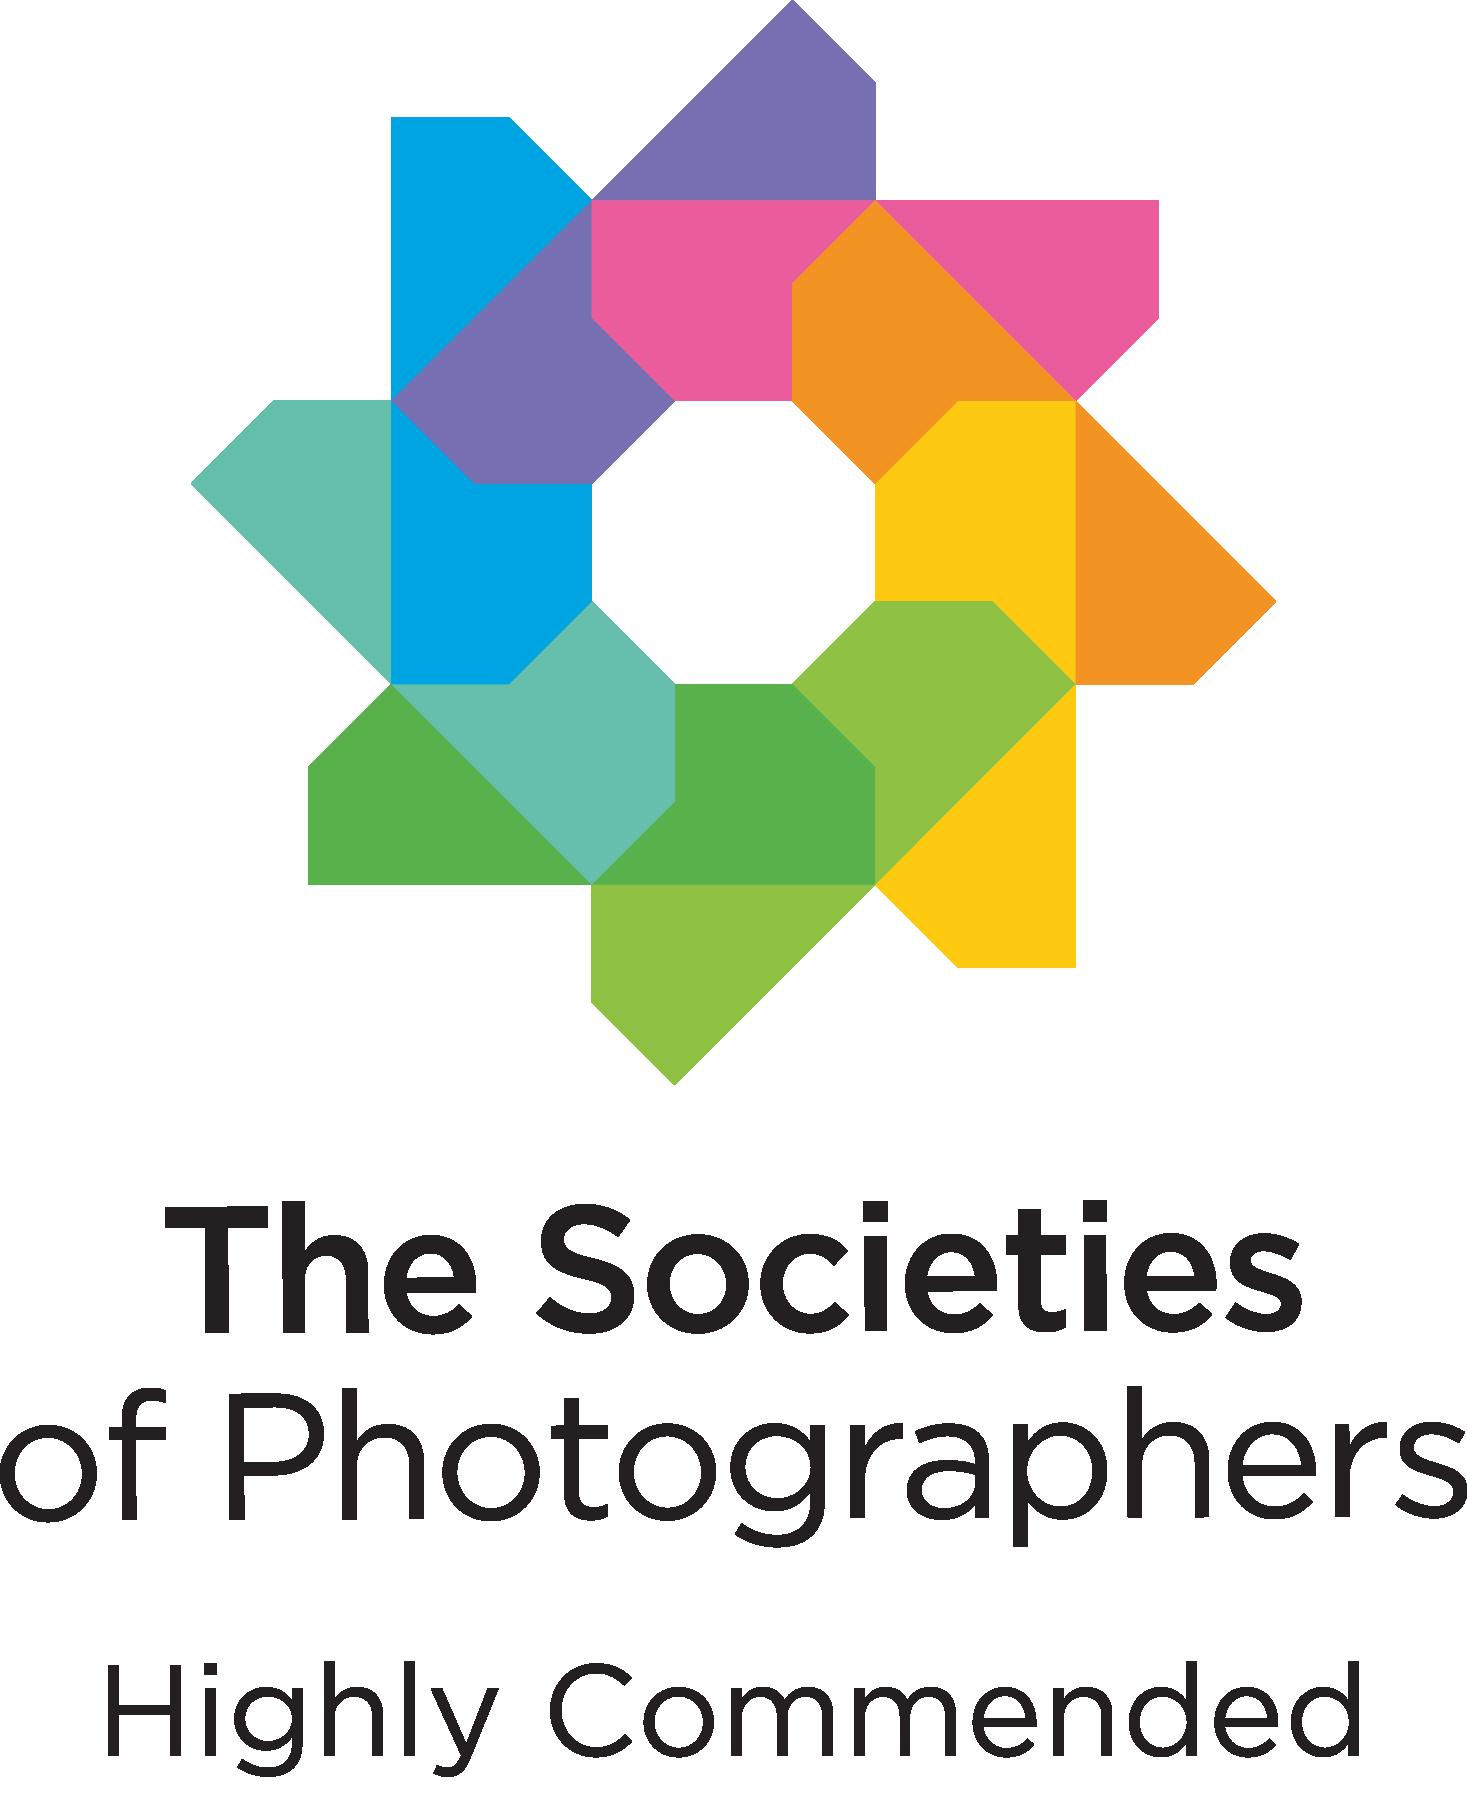 the societies HC